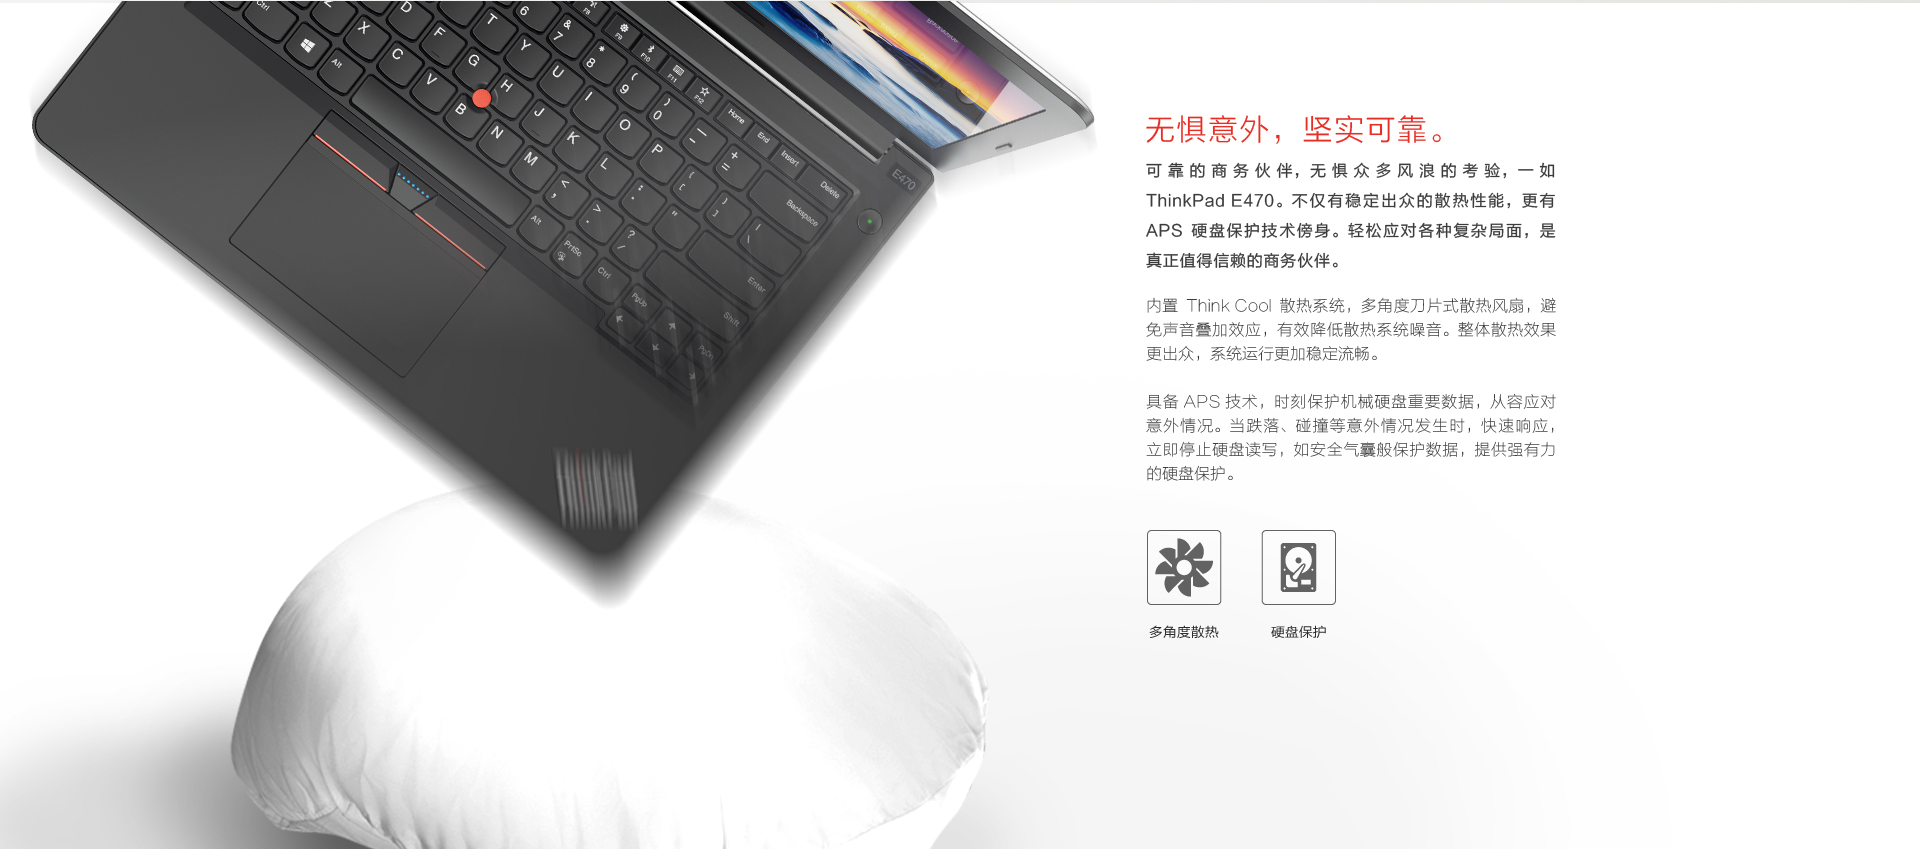 ThinkPad E470-77.jpg